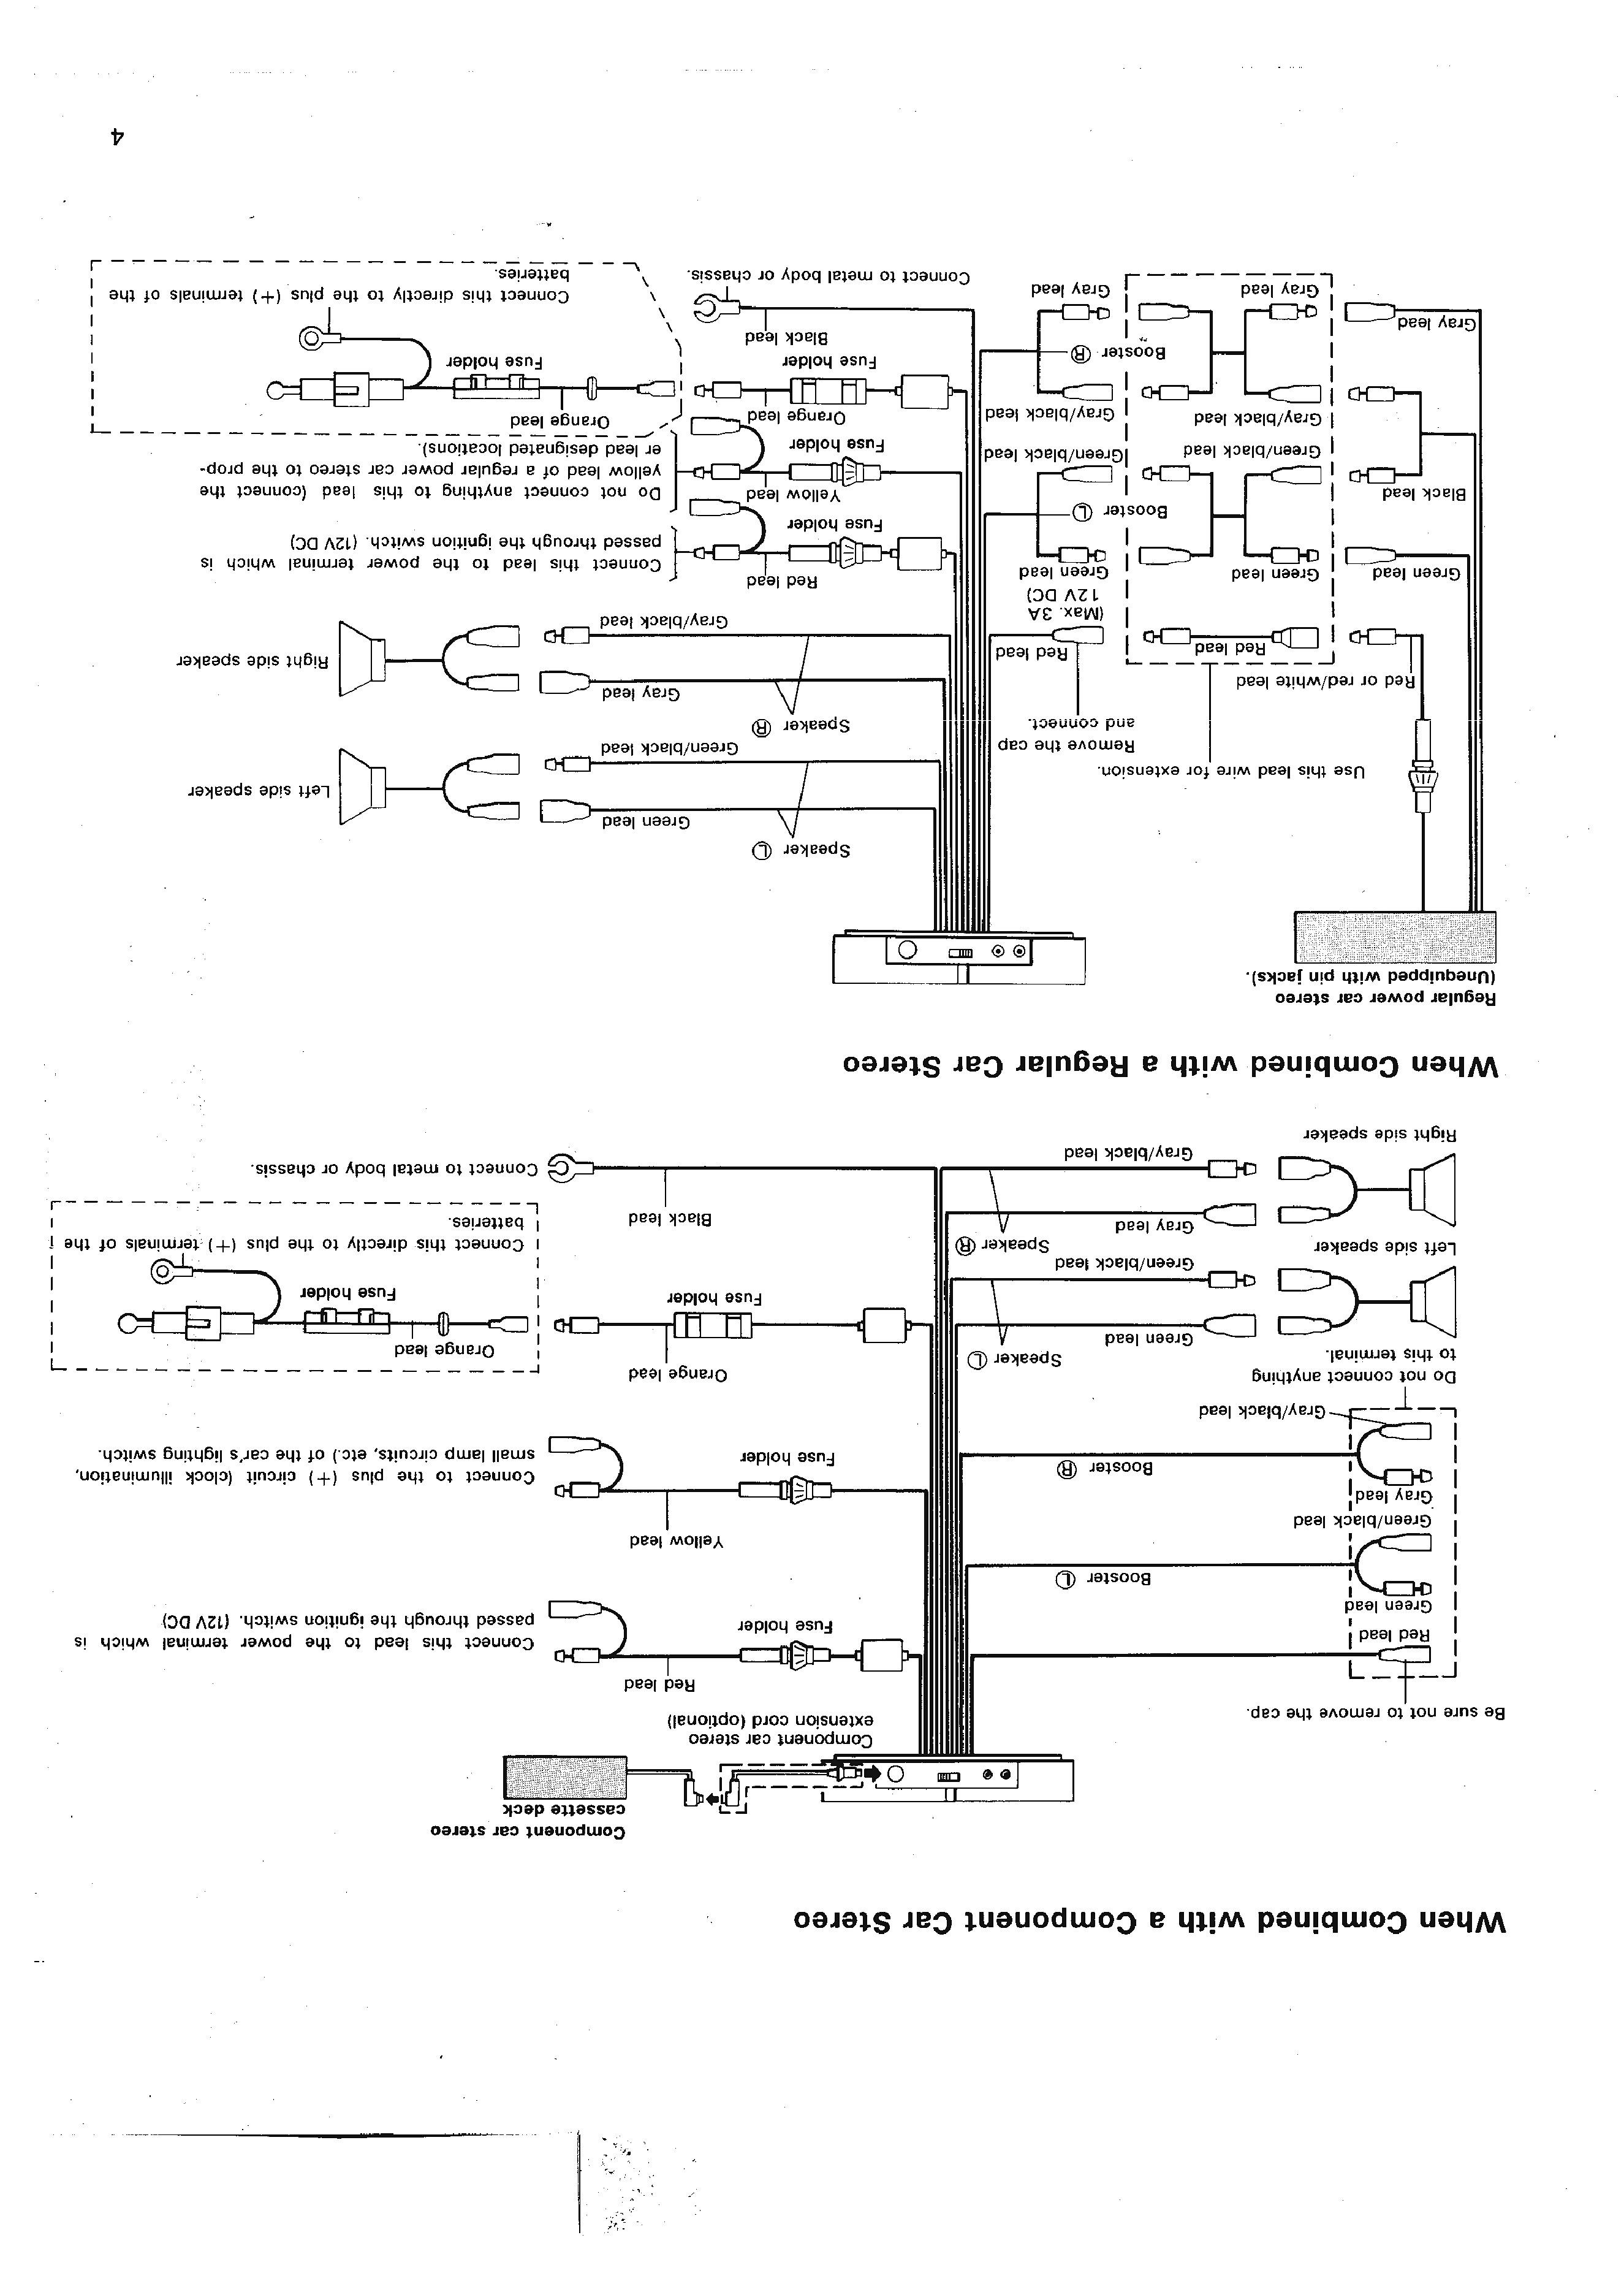 pioneer deh 150mp wiring diagram - deh 150mp wiring diagram download pioneer  deh 150mp wiring diagram